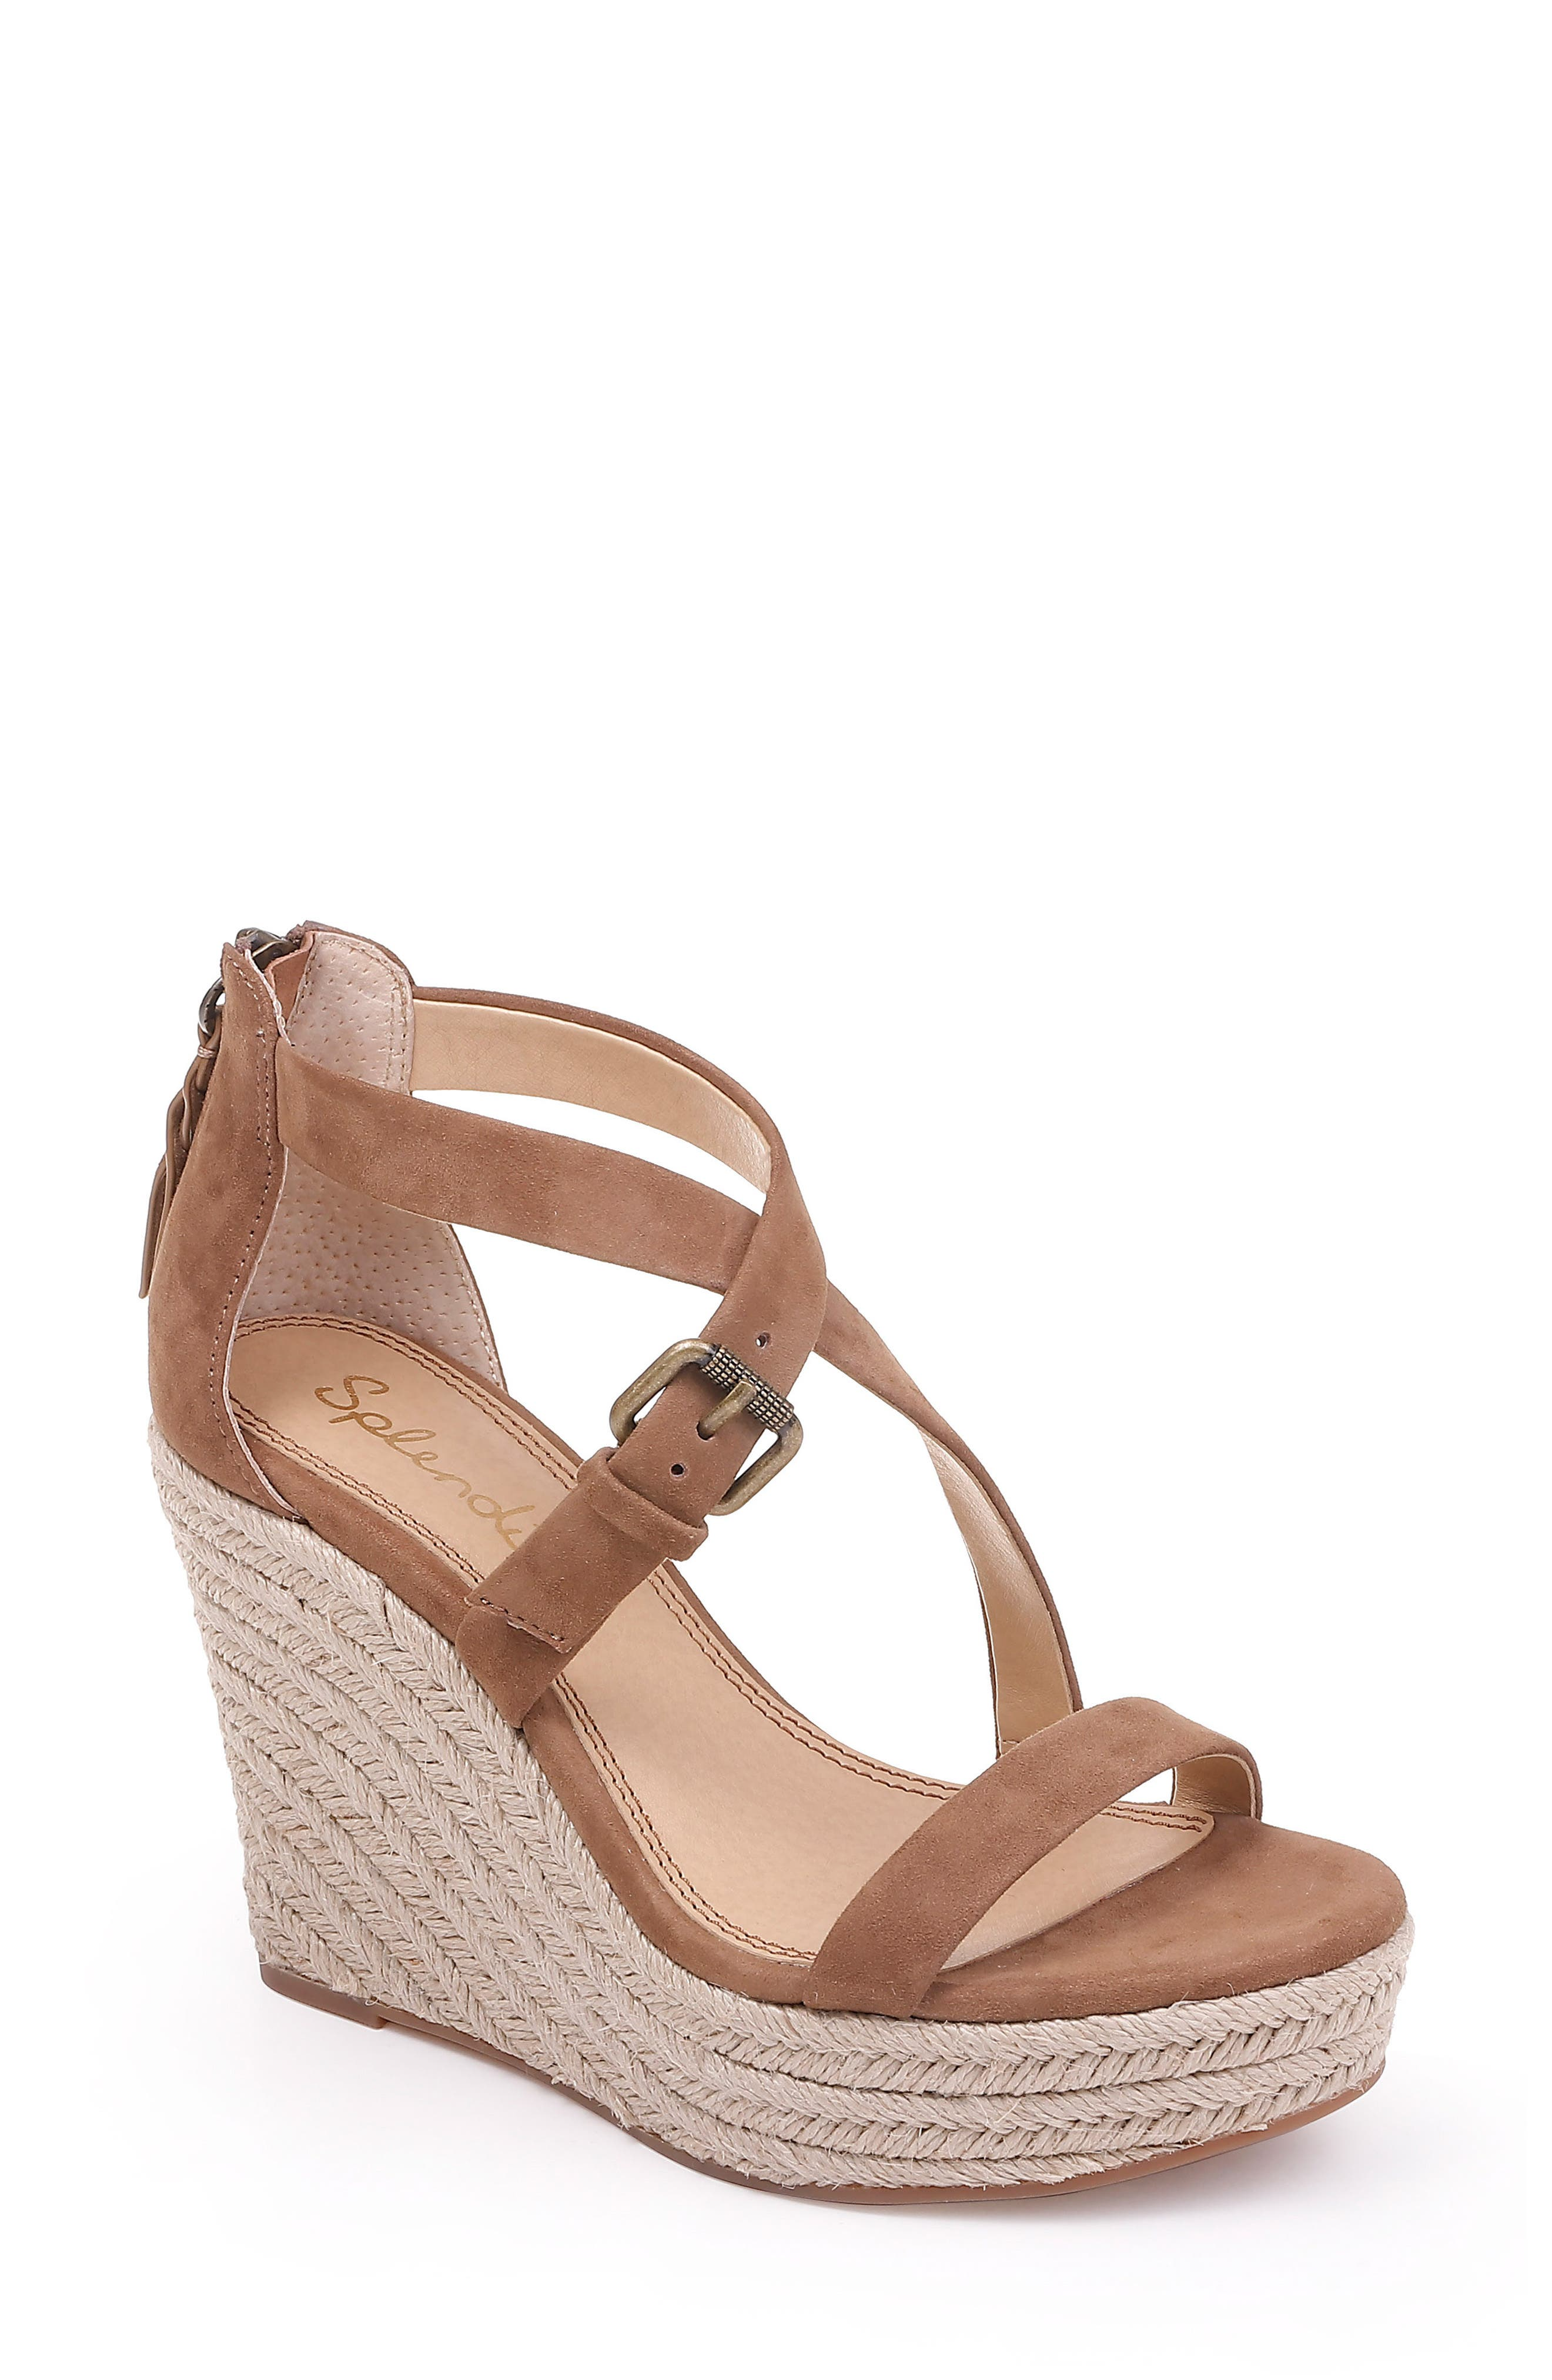 289a4ab7e11 Women s Splendid Espadrille Sandals